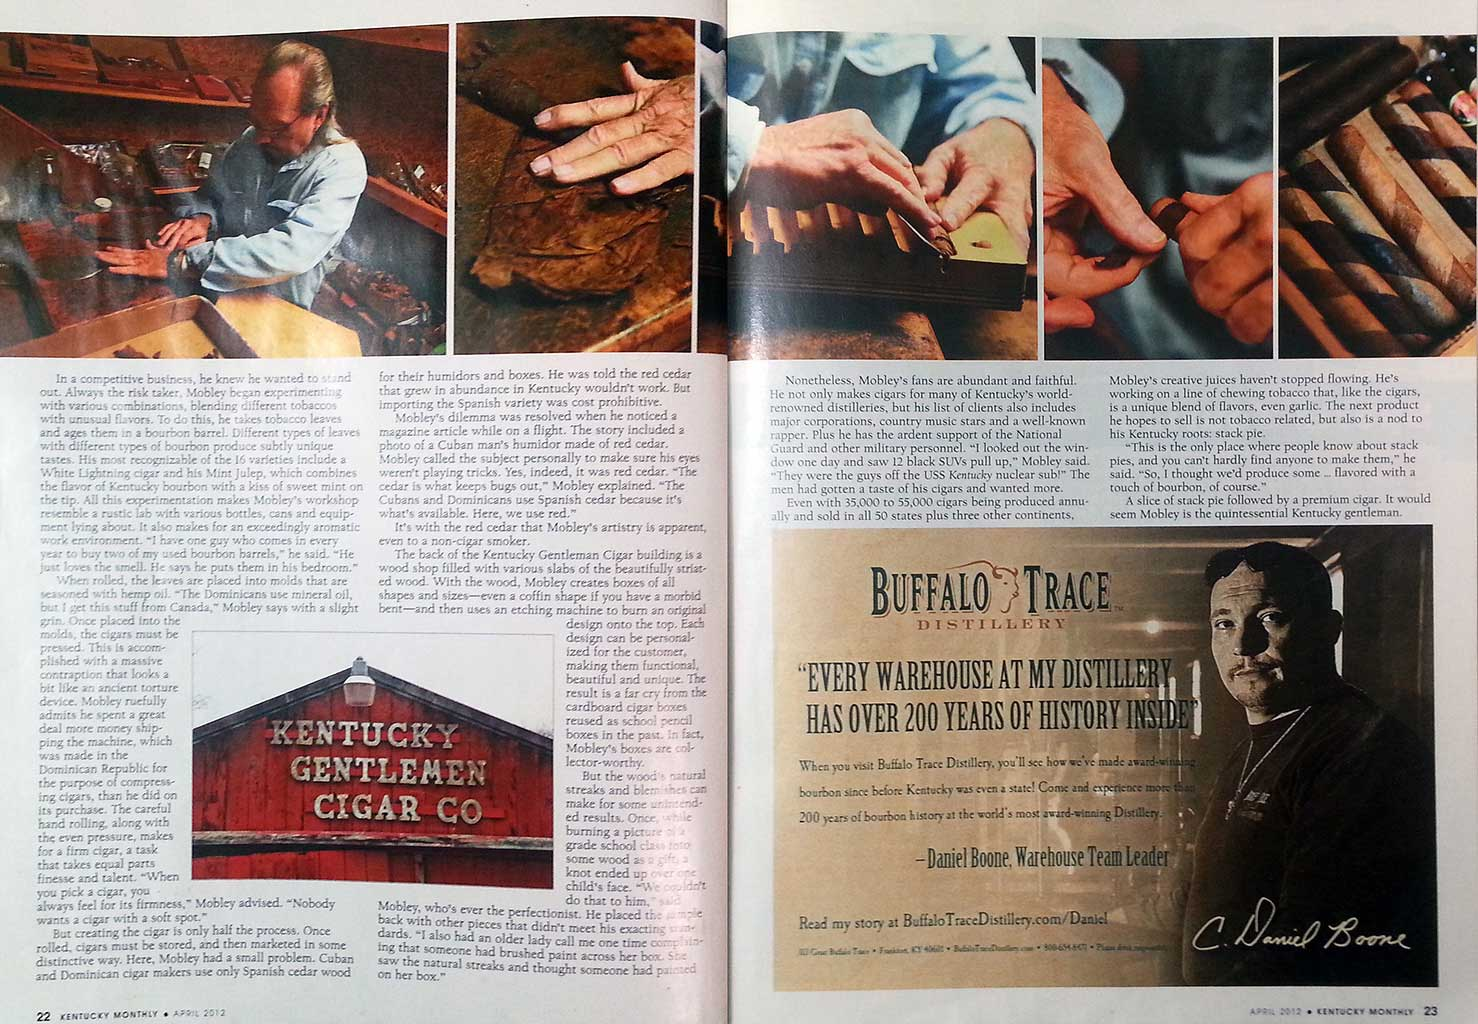 Keep on Rollin' - Bourbon barrel-aged stogies - Kentucky Monthly Magazine